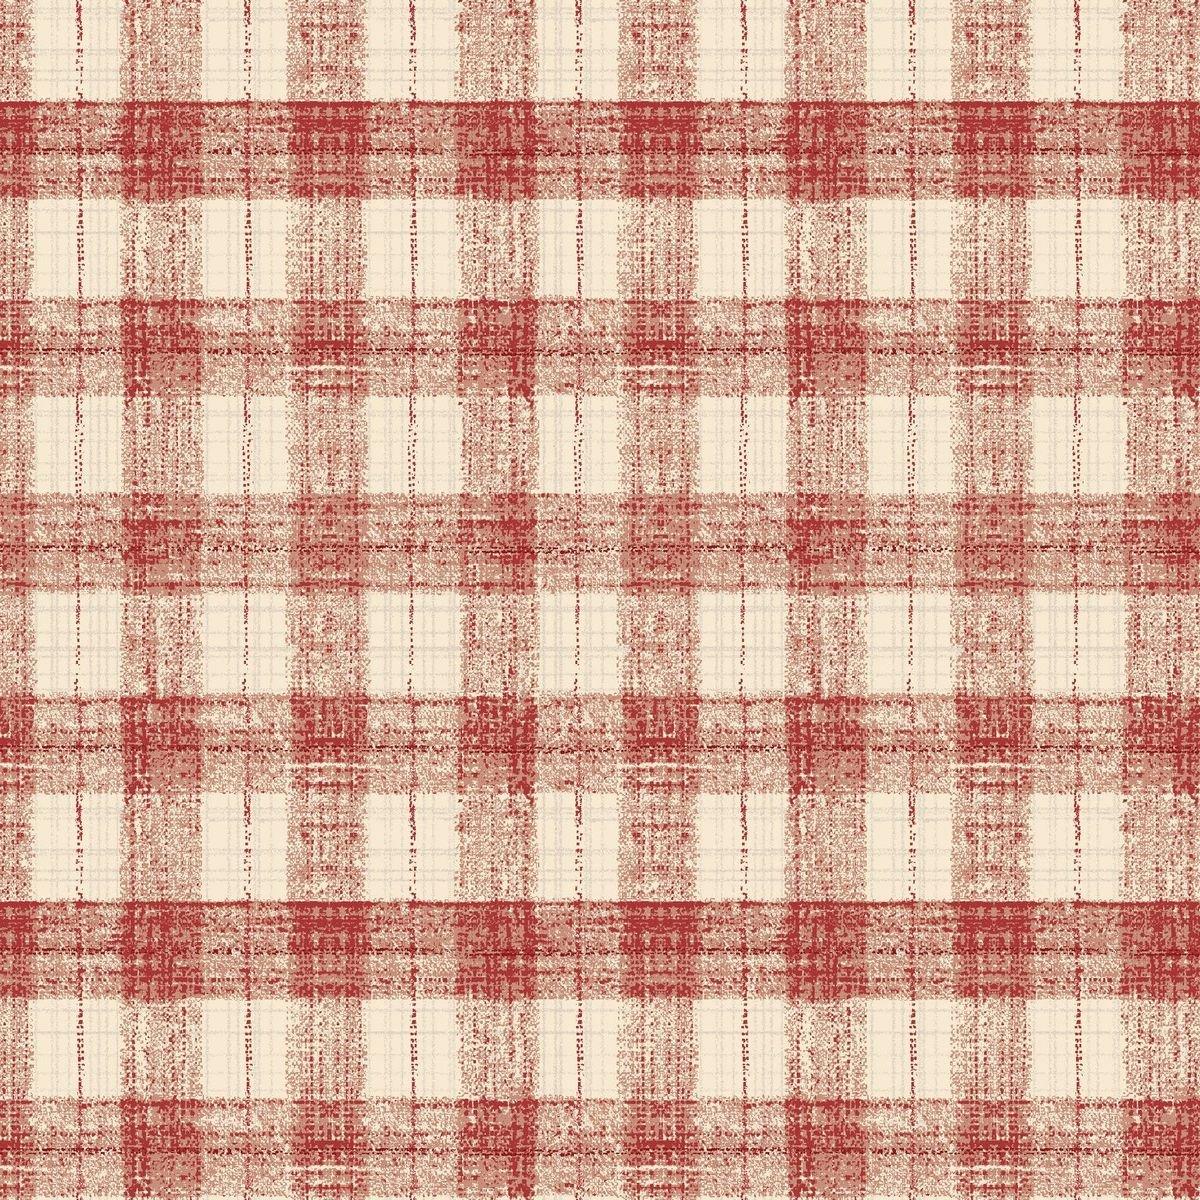 HG-Blessings of Home 2680-82 Lt Red/Cream - Monotone Checks